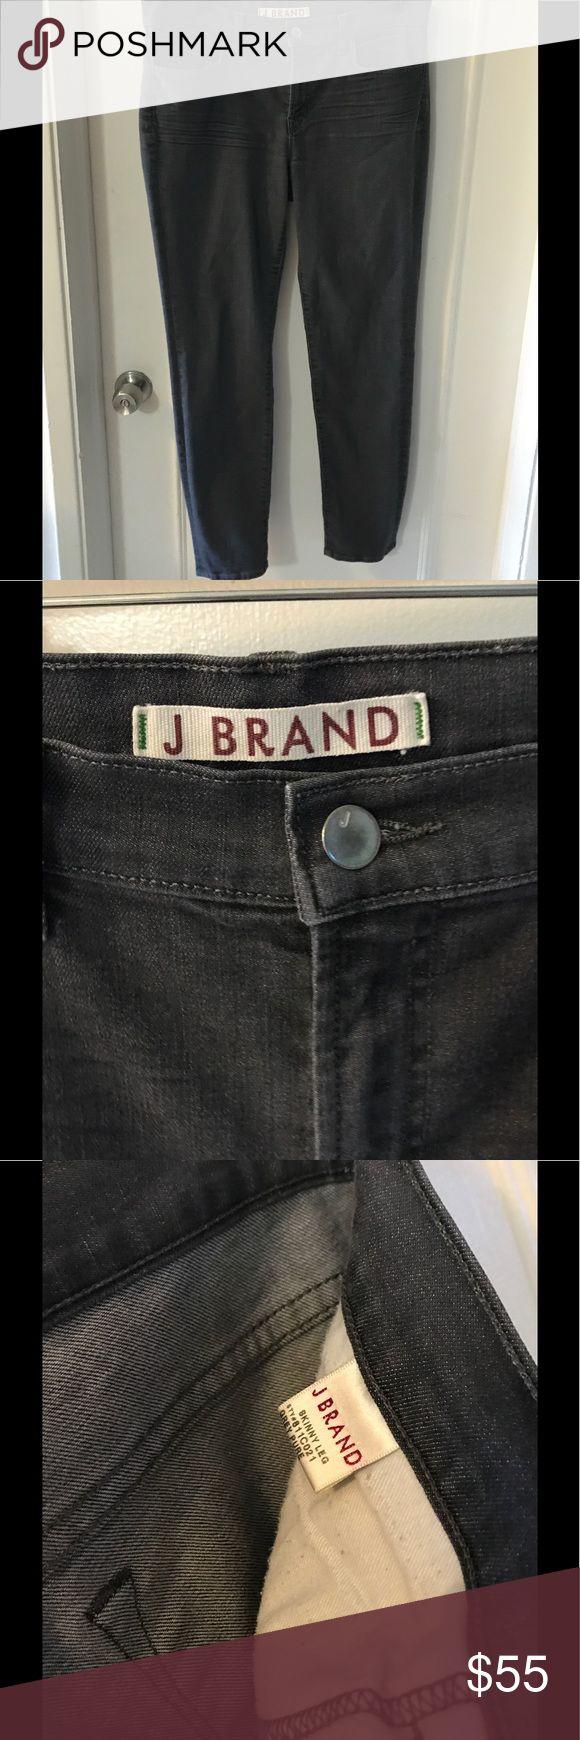 J Brand skinny jeans Cute gray J.Brand  jeans, in great condition J Brand Jeans Skinny